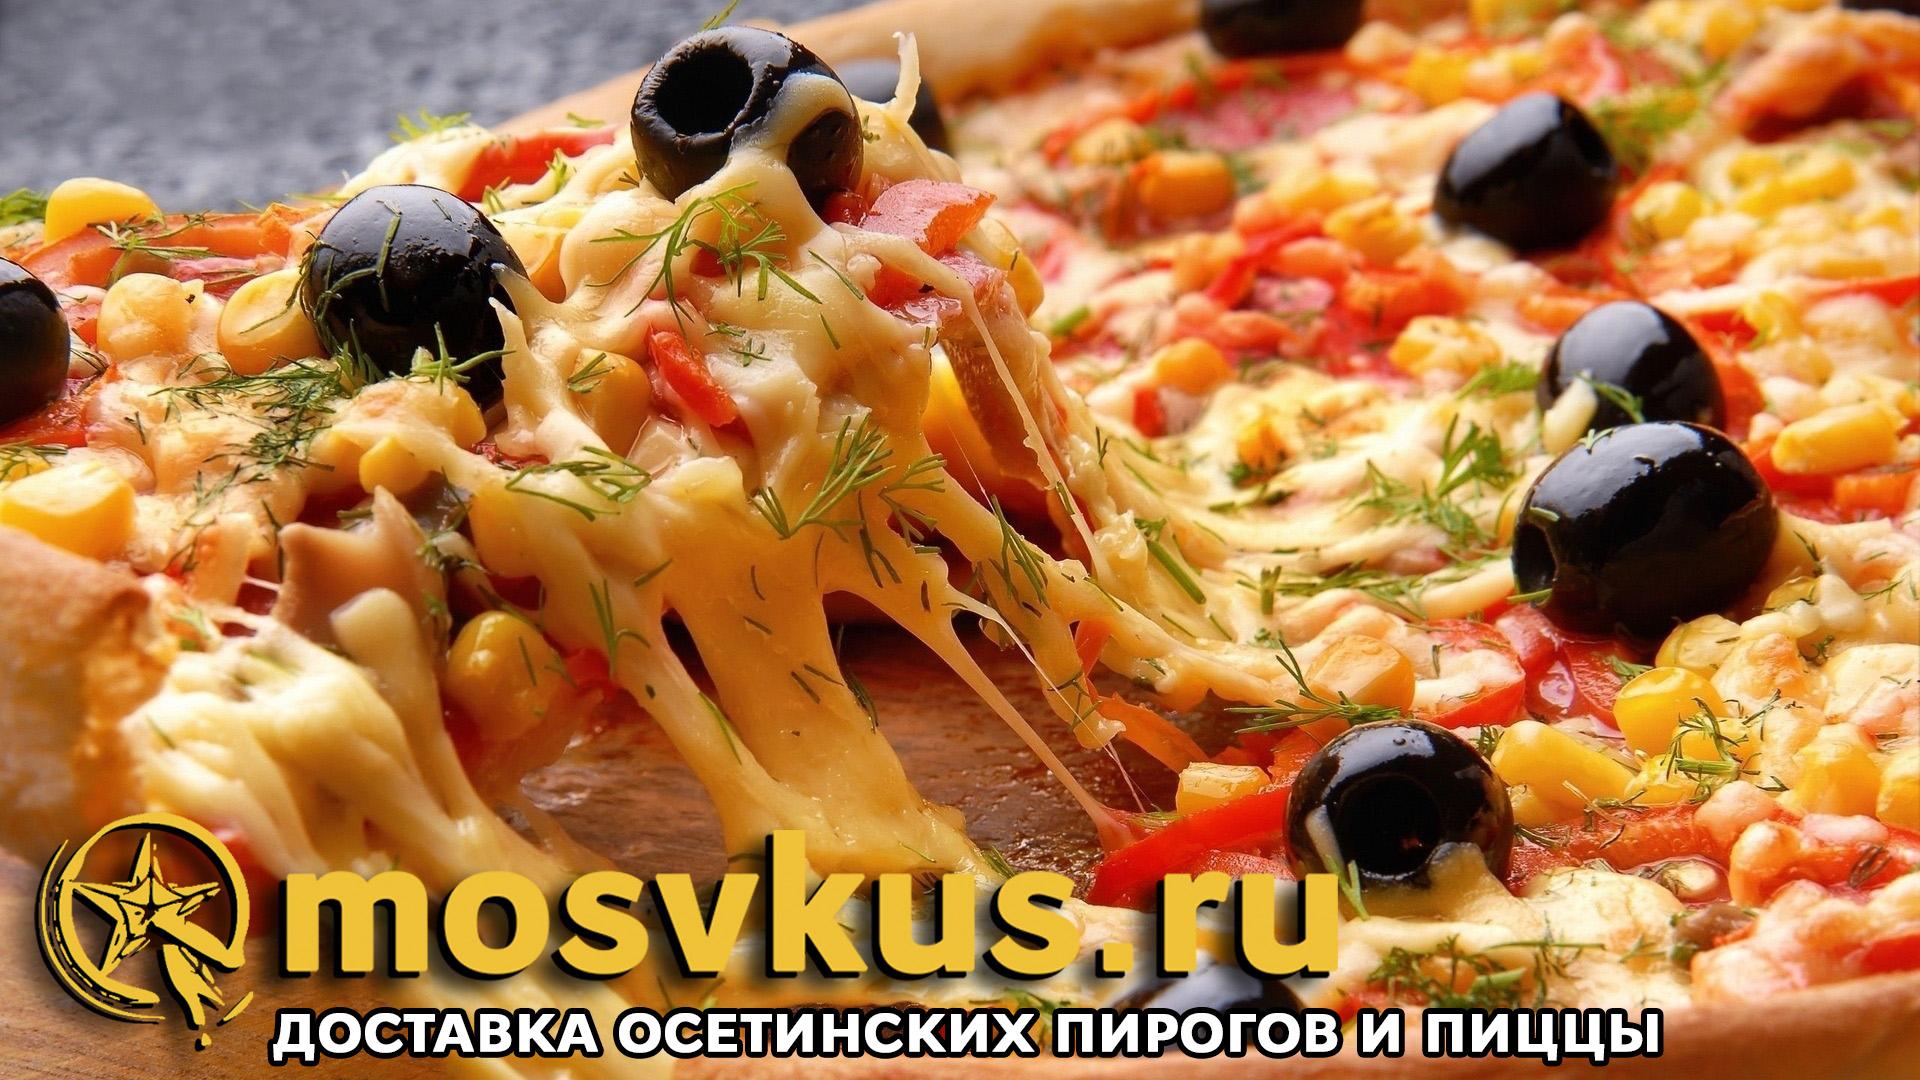 пицца москва доставка рейтинг